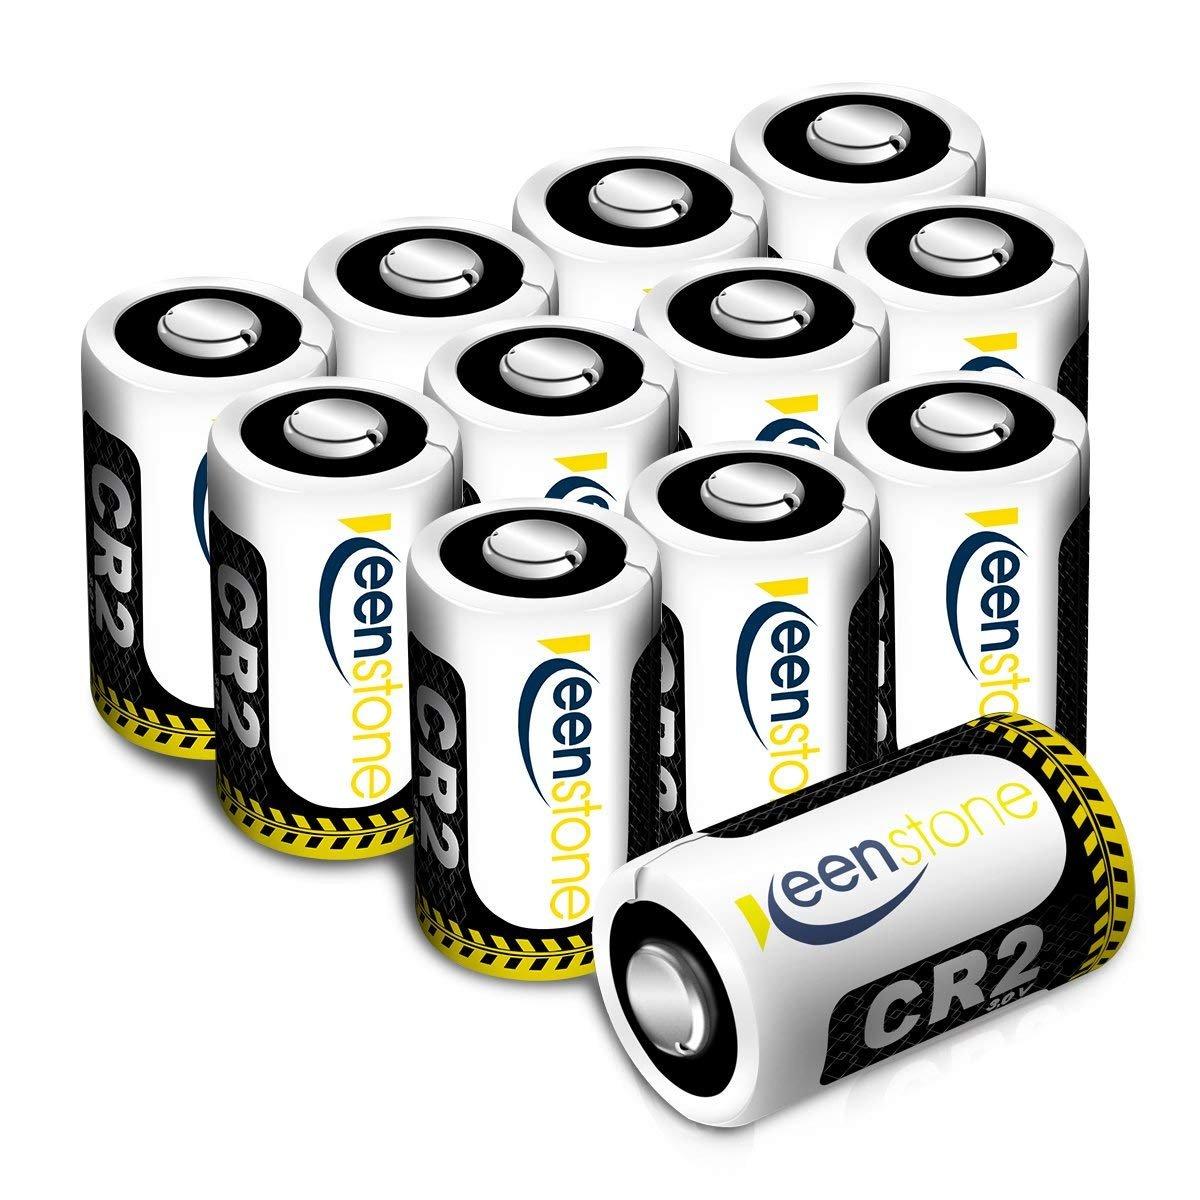 12 pcs Keenstone 3 V 850 mAh cr2リチウムバッテリー超高パフォーマンス – 低自己放電 – 高エネルギー密度with PTC保護された写真デジタルカメラビデオカメラおもちゃの懐中電灯トーチ B01JG4ZNP2